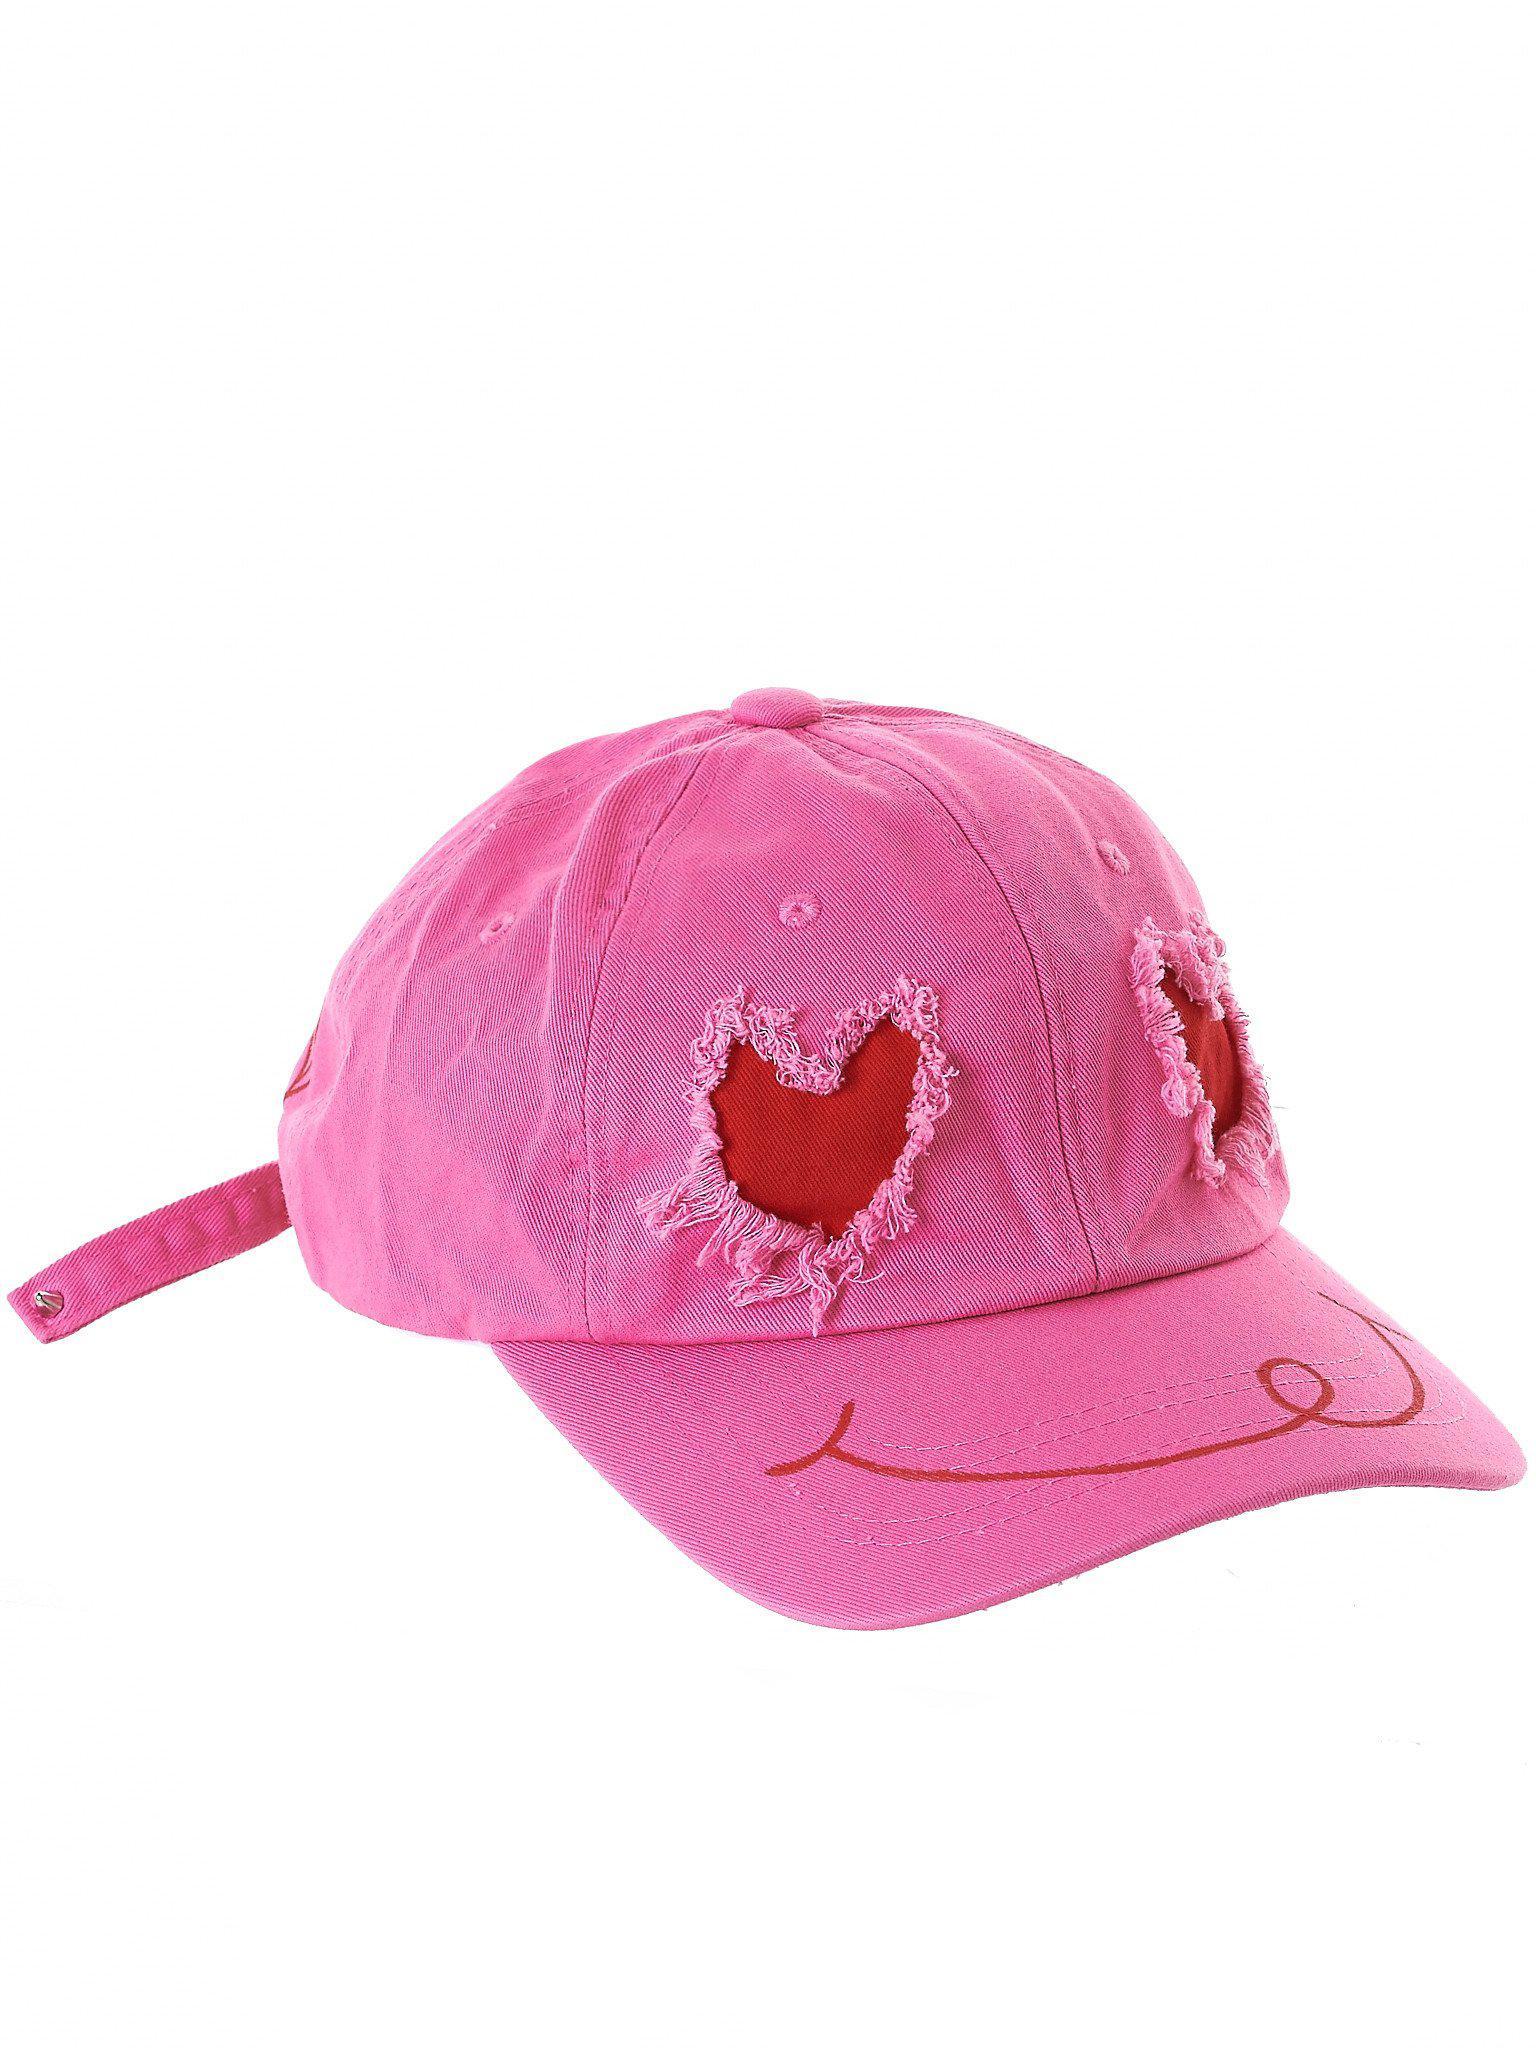 13db3fa7dd5de4 99% Is Distressed Baseball Cap in Pink - Lyst